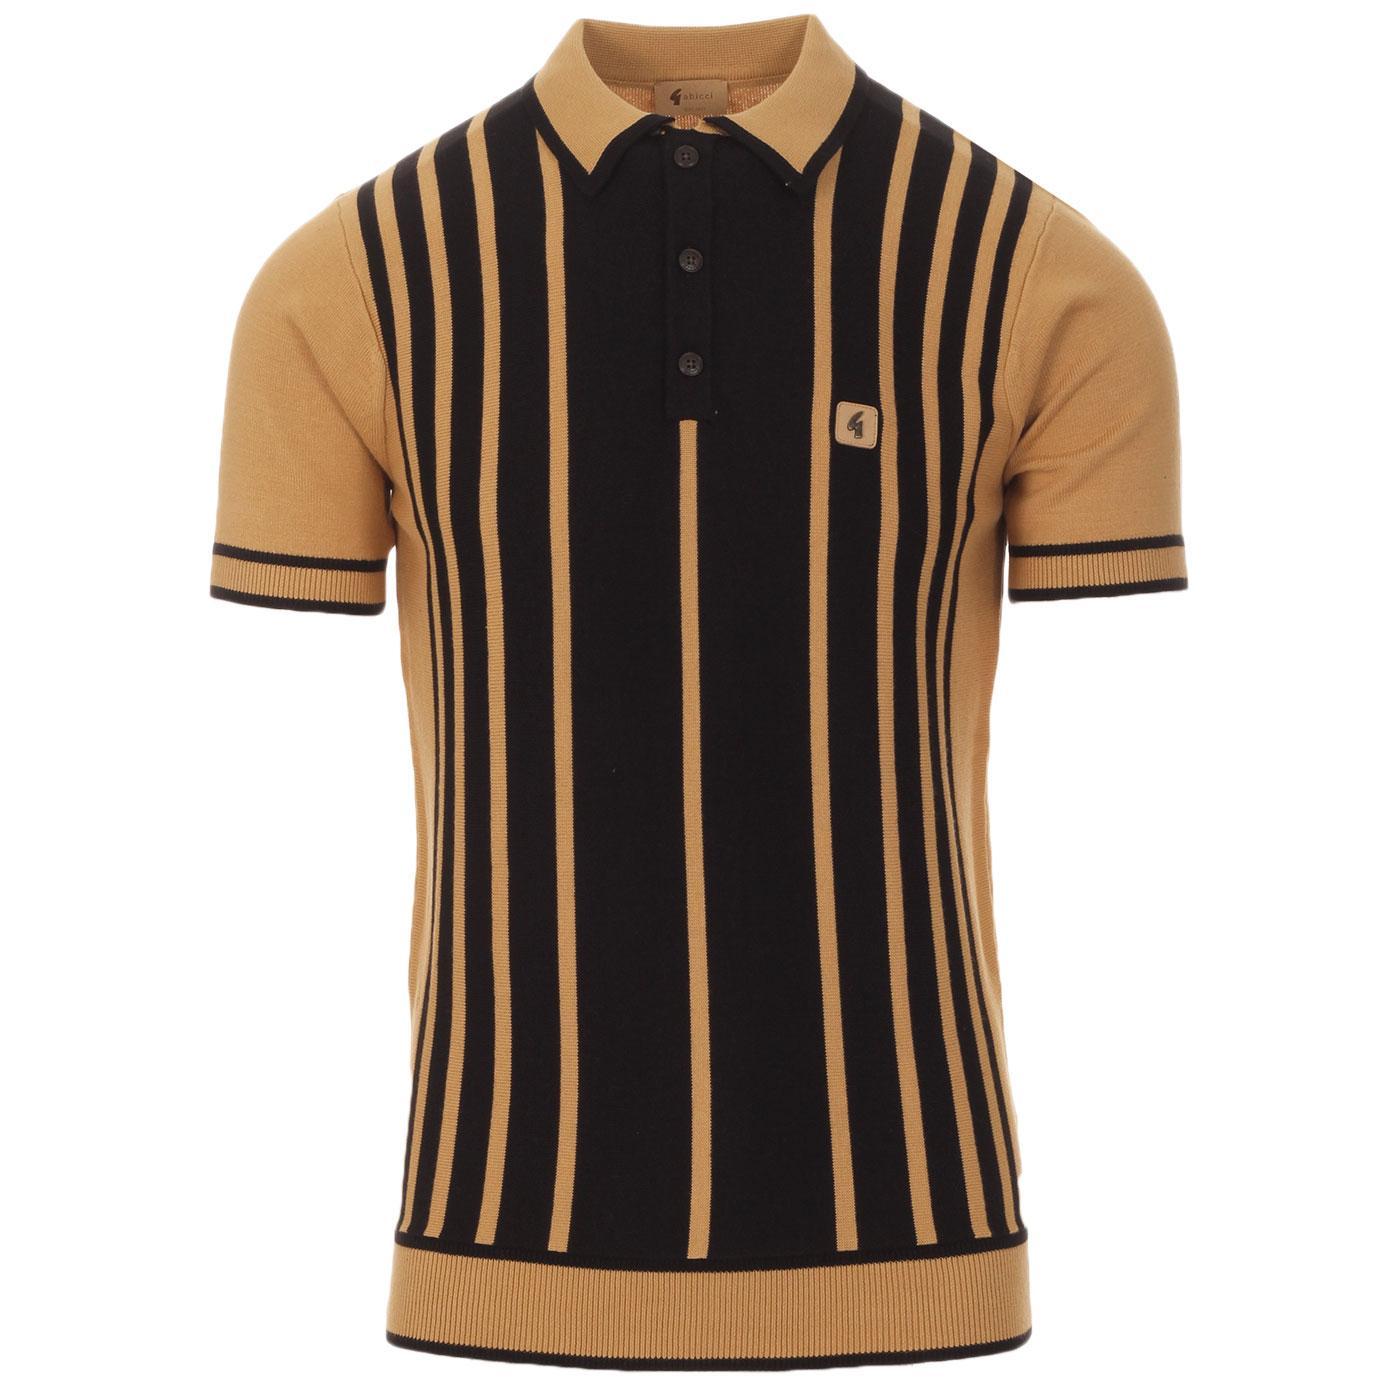 Peck GABICCI VINTAGE 60s Mod Stripe Knit Polo SAND